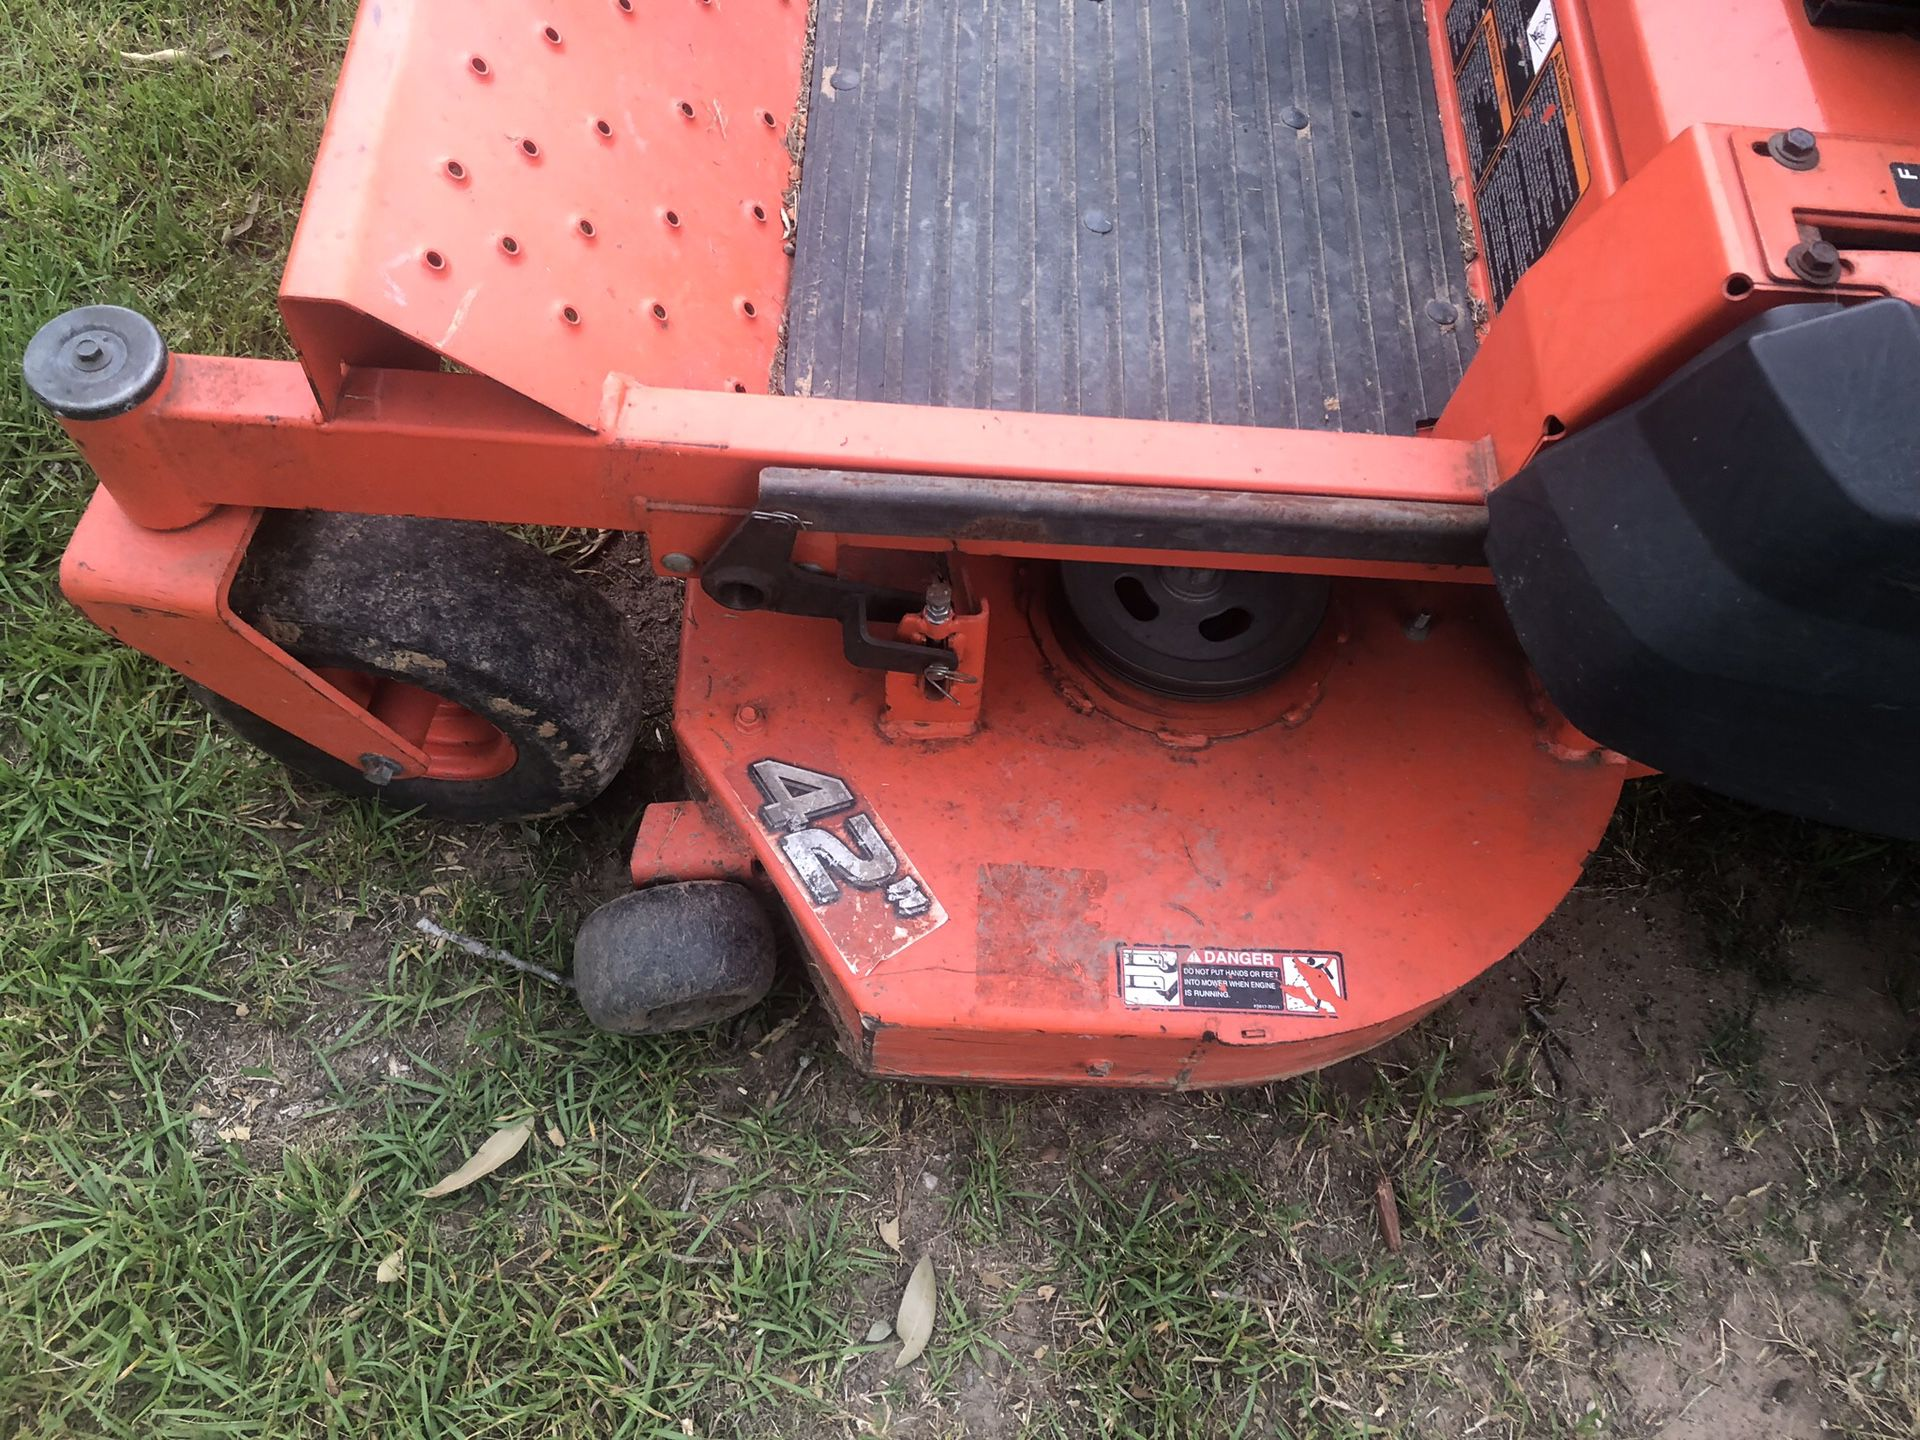 42 inch 0 turn Kubota mower. Drives great very clean low hours.